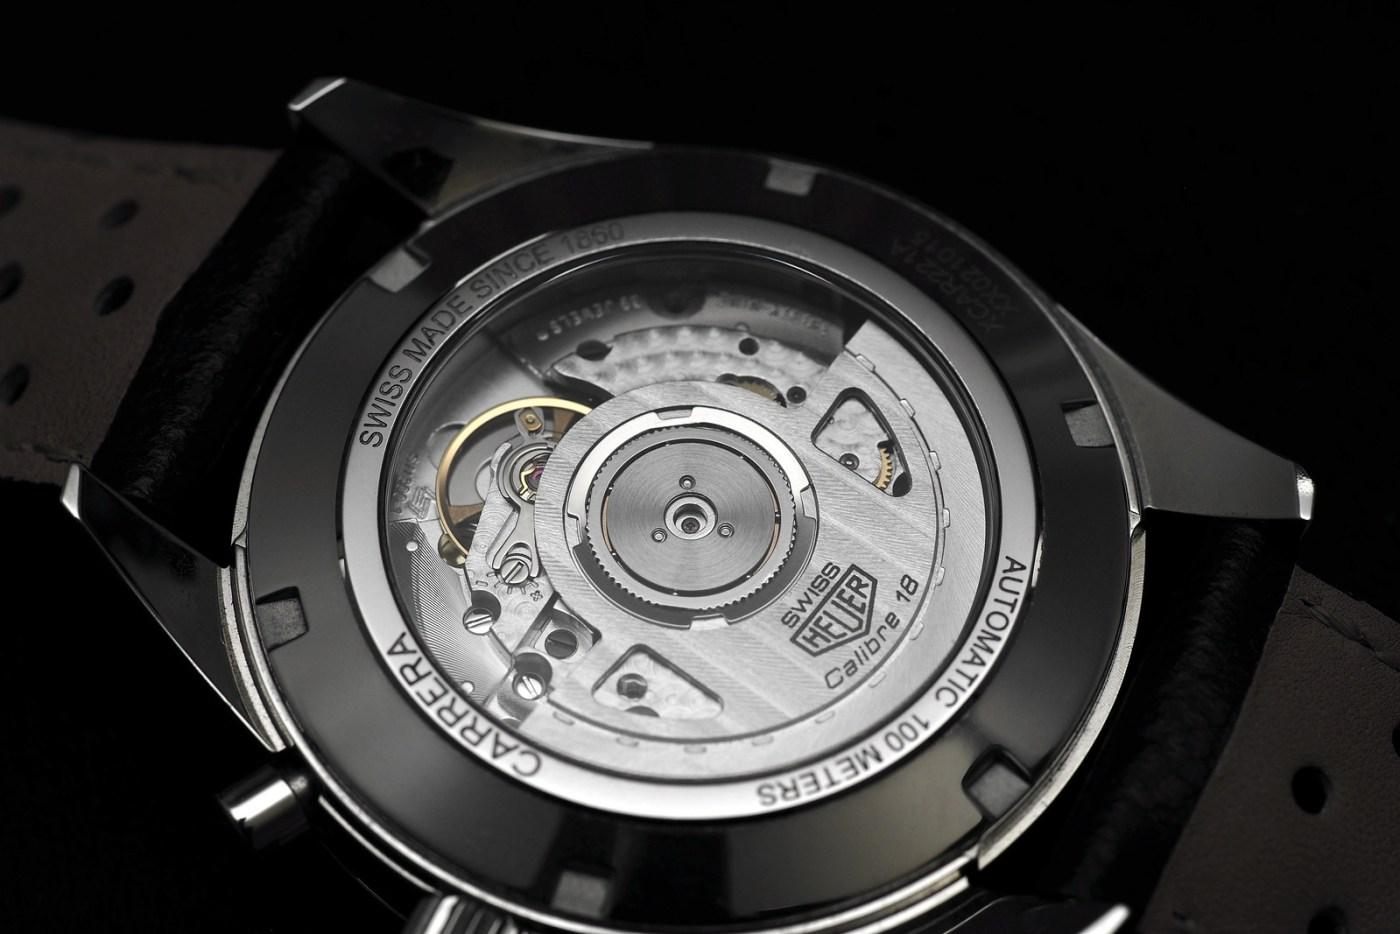 TAG Heuer Carrera Calibre 18 Automatic Chronograph movement